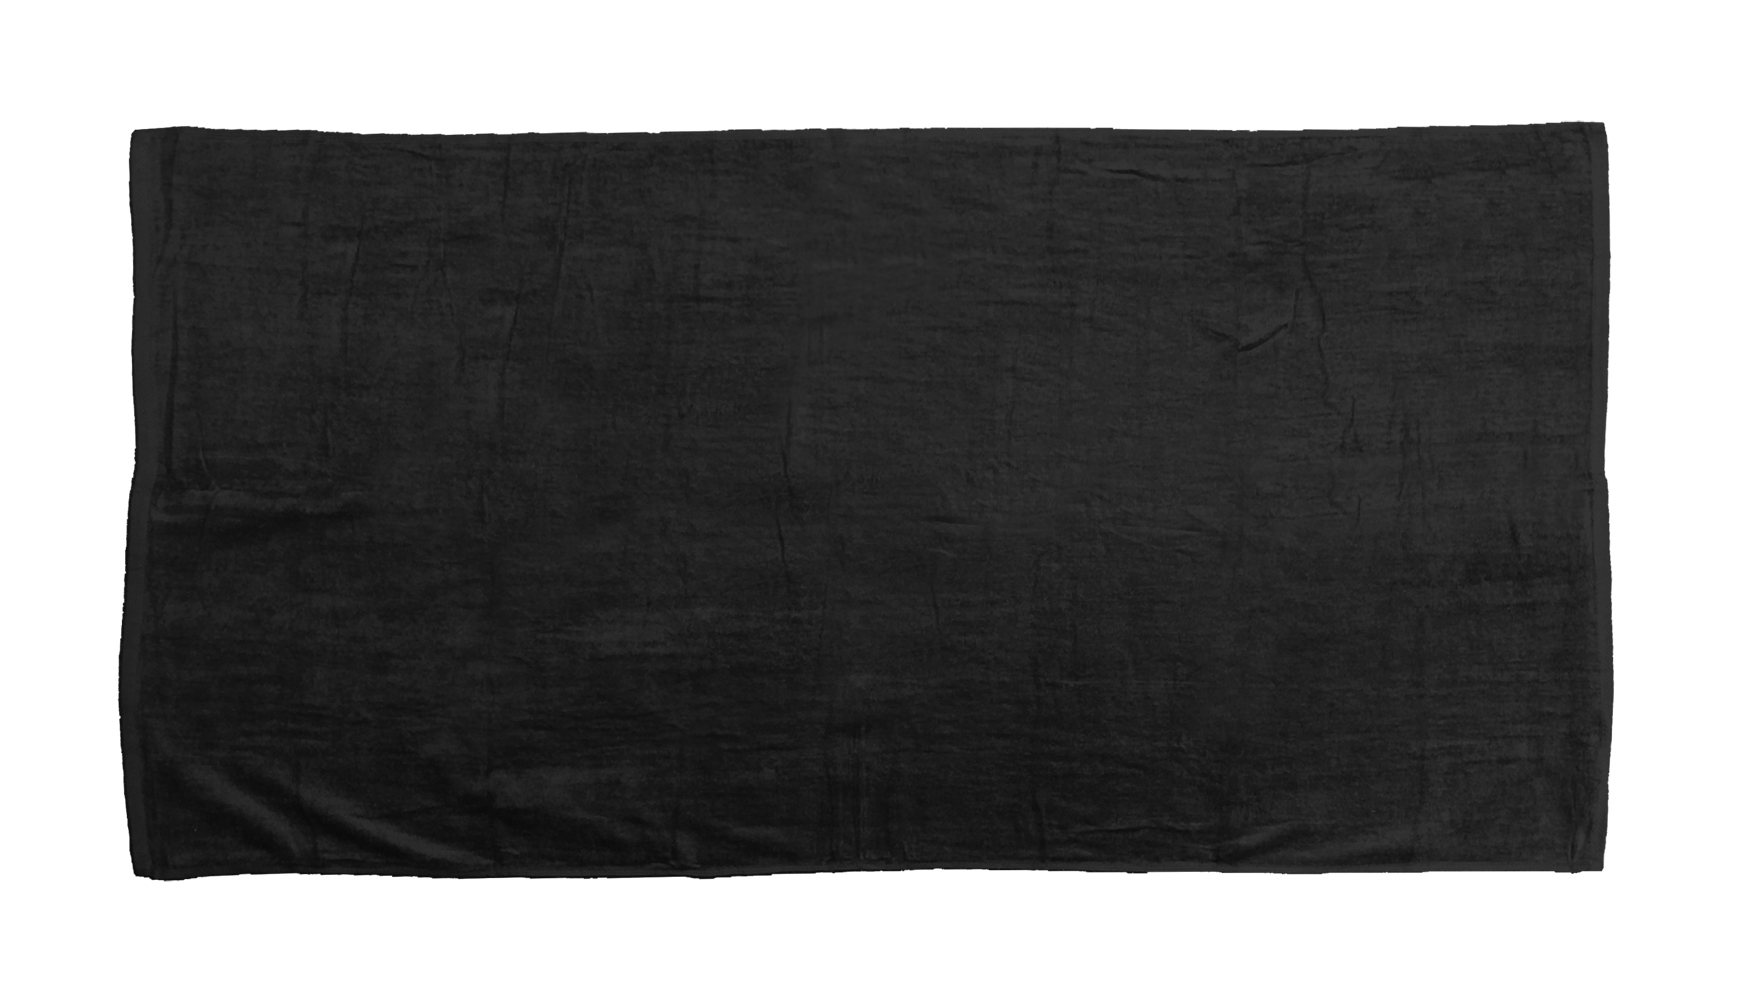 blank white beach towel. Black Blank White Beach Towel